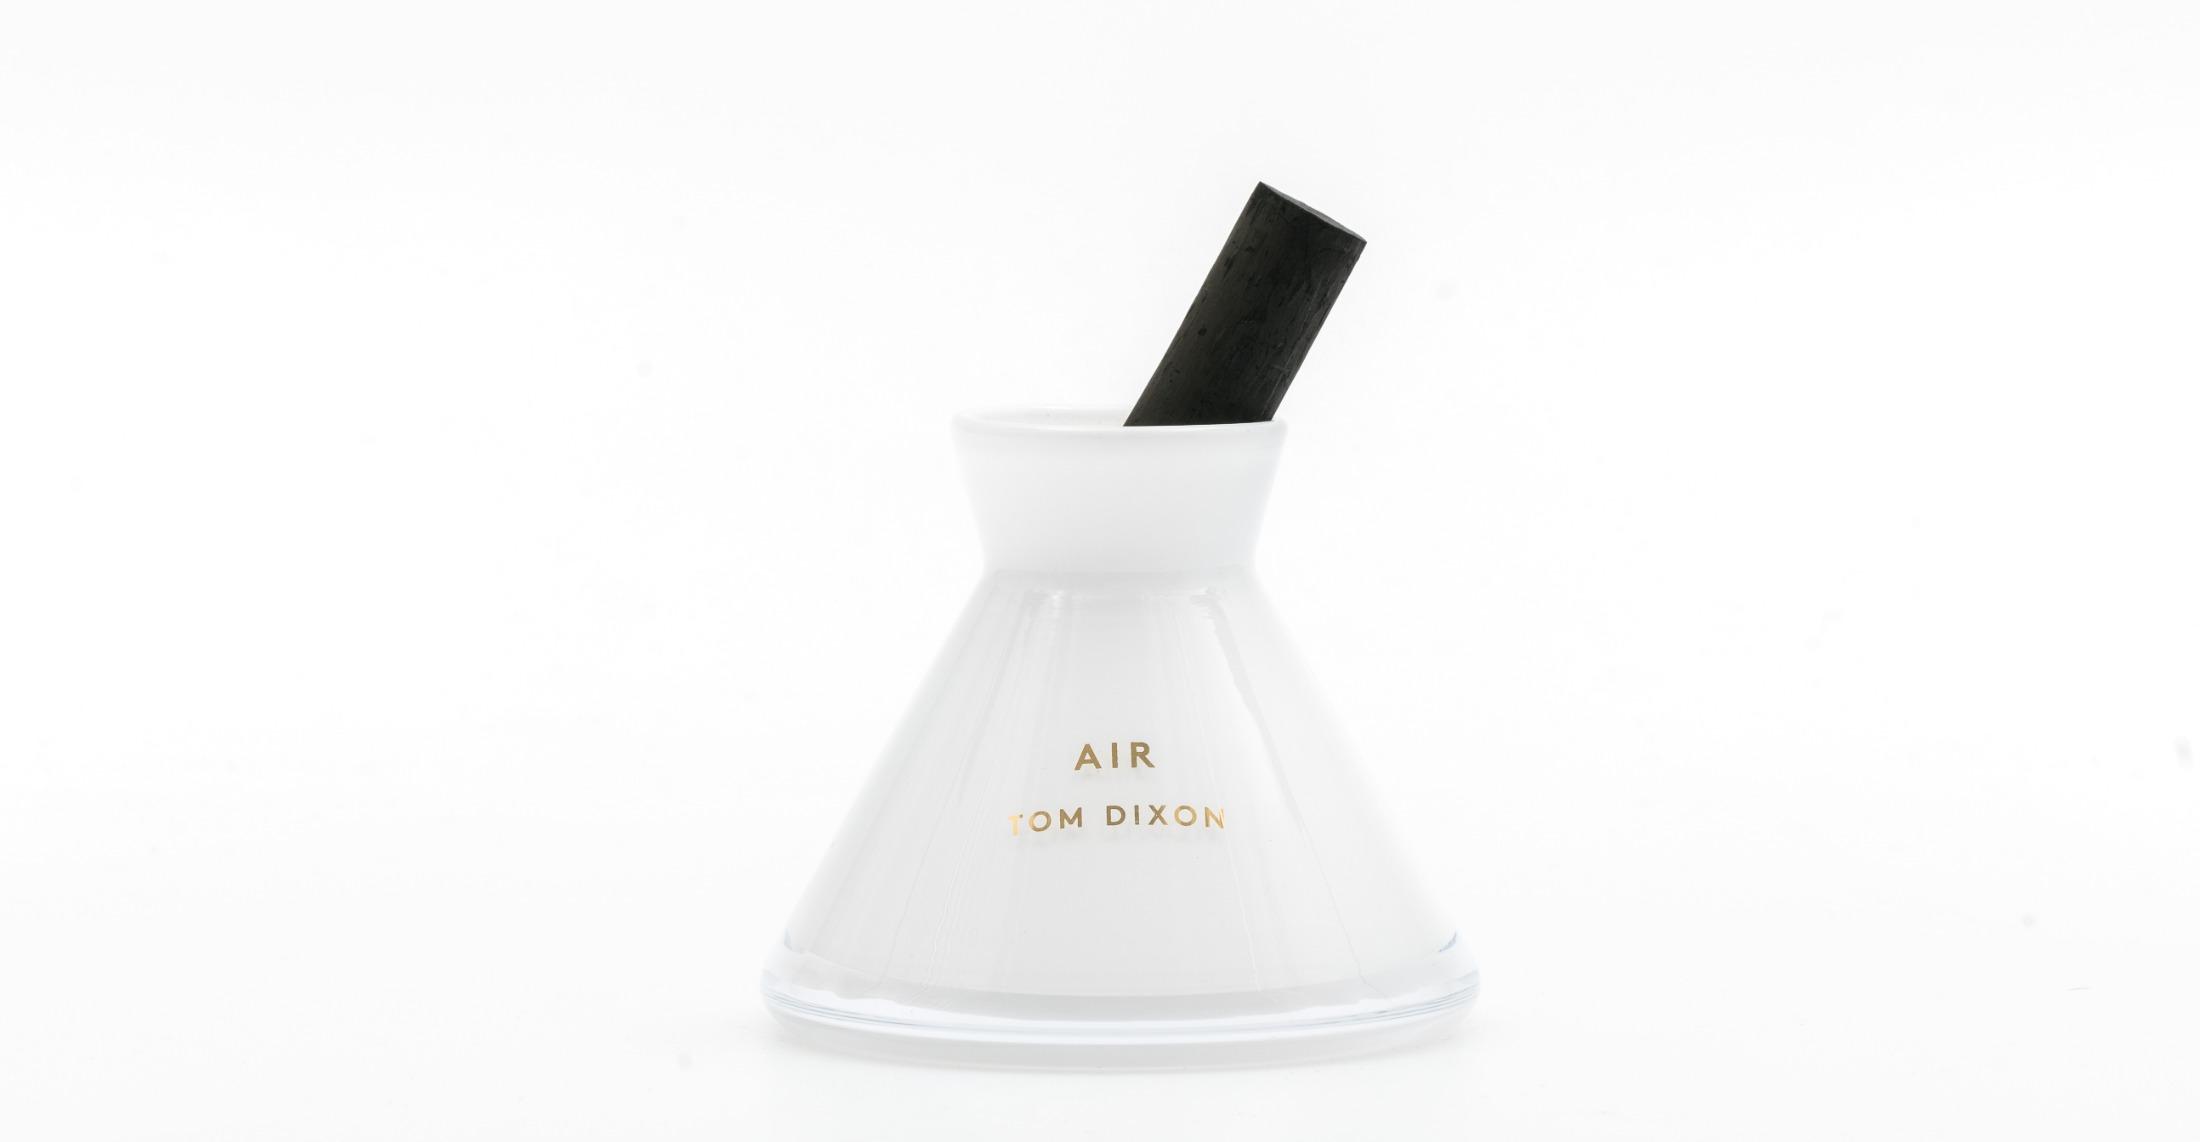 Air Tom Dixon